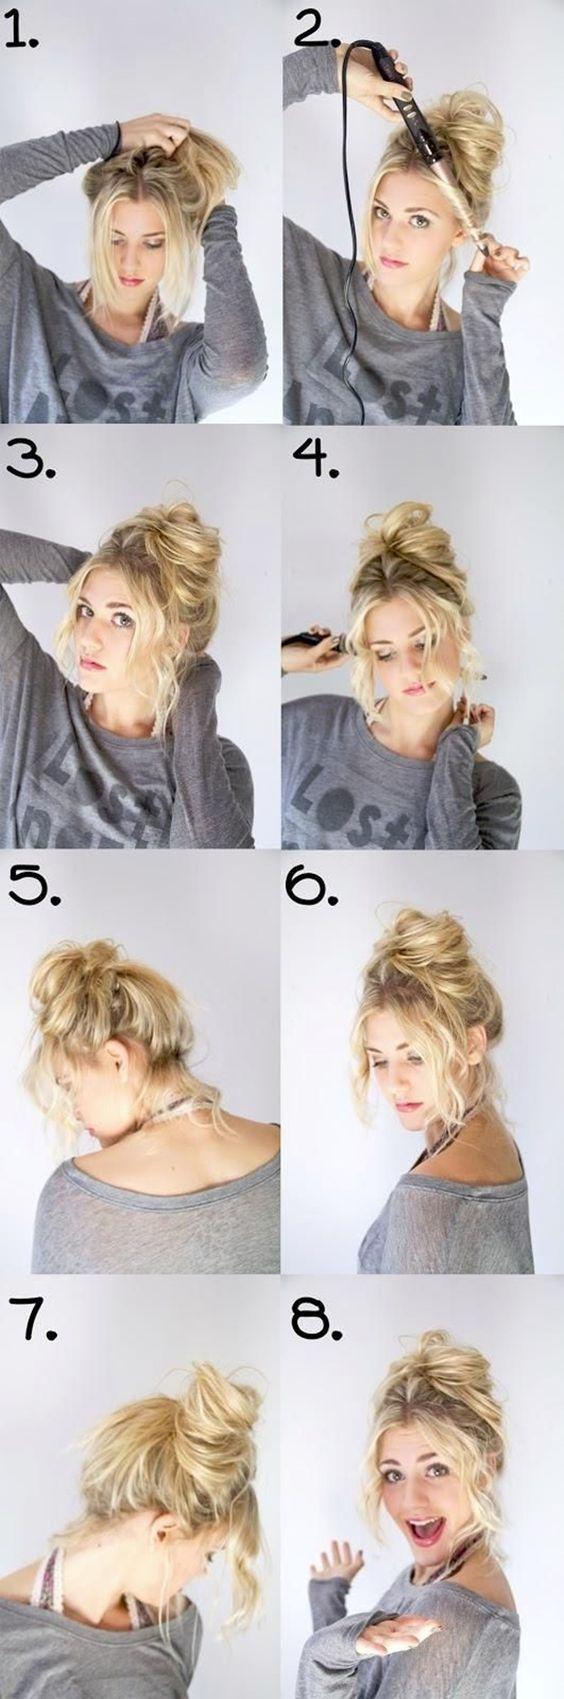 #Bun #HAIR #Hairstyles #LONG #messy #Perfect